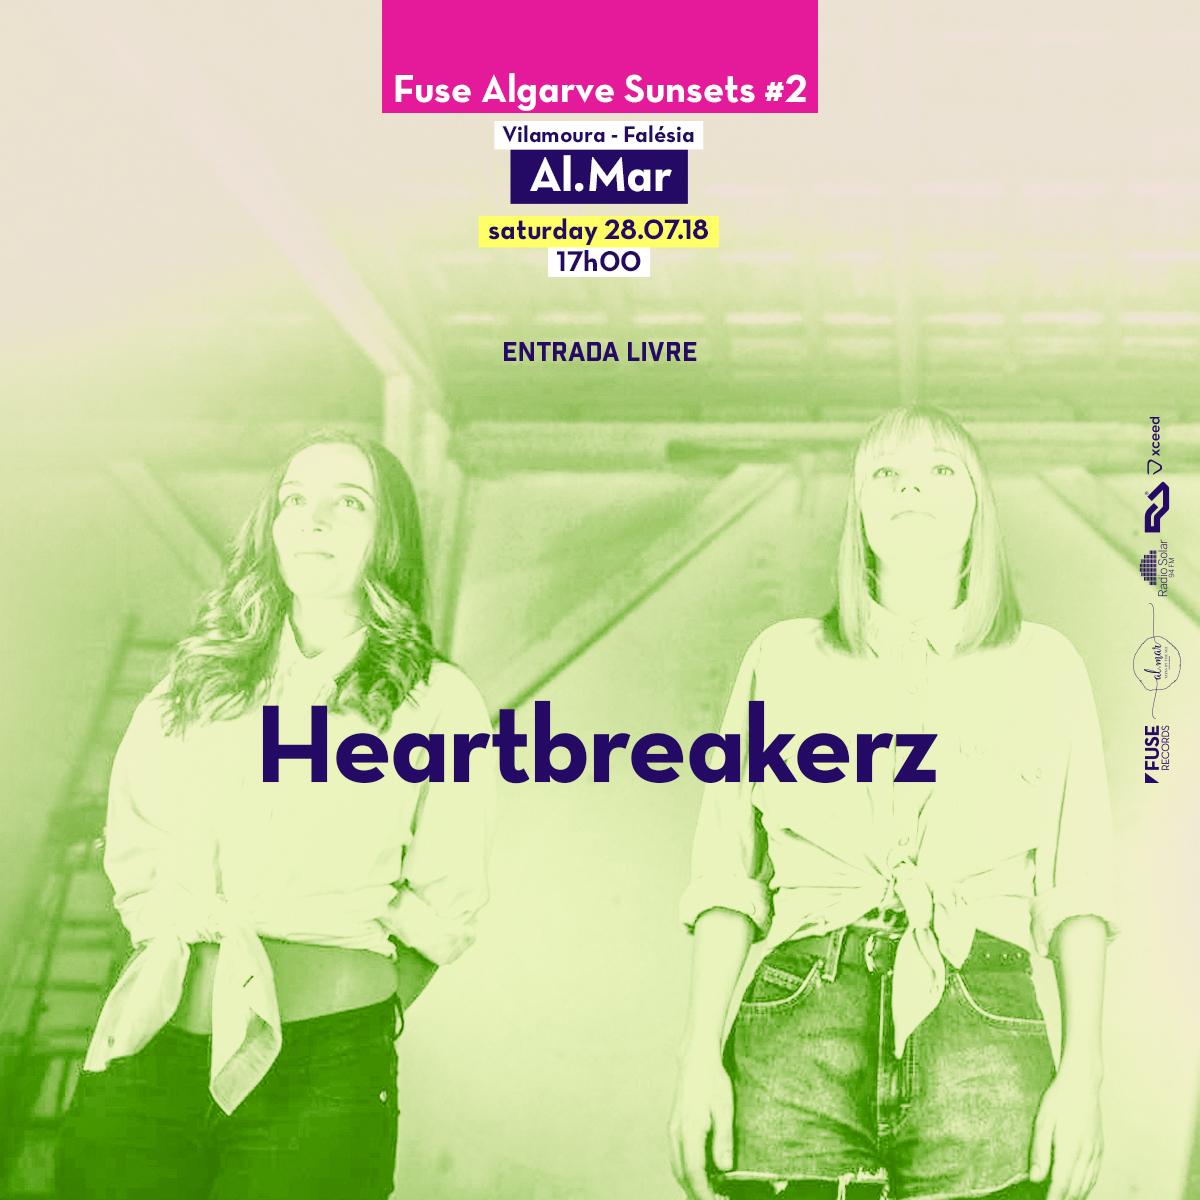 FuseMatine_28072018_Heartbreakerz_Profile_3.jpg